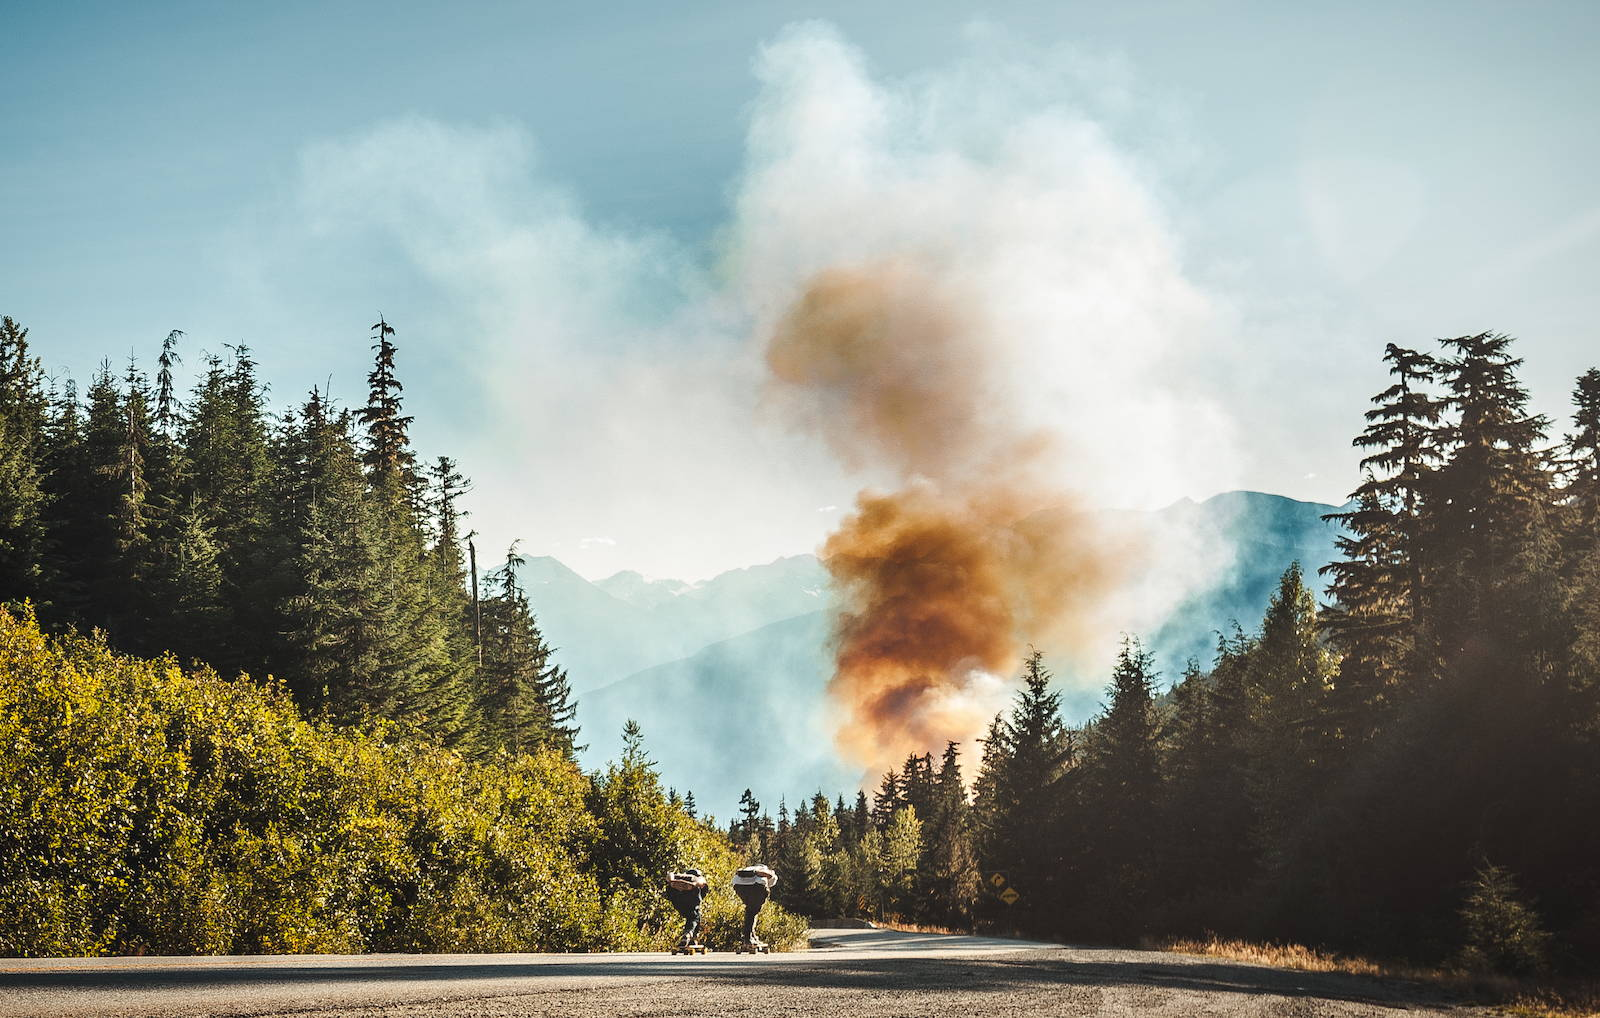 Mtn. Pursuits Canadian Coast Mountains Downhill Smokey Cruise